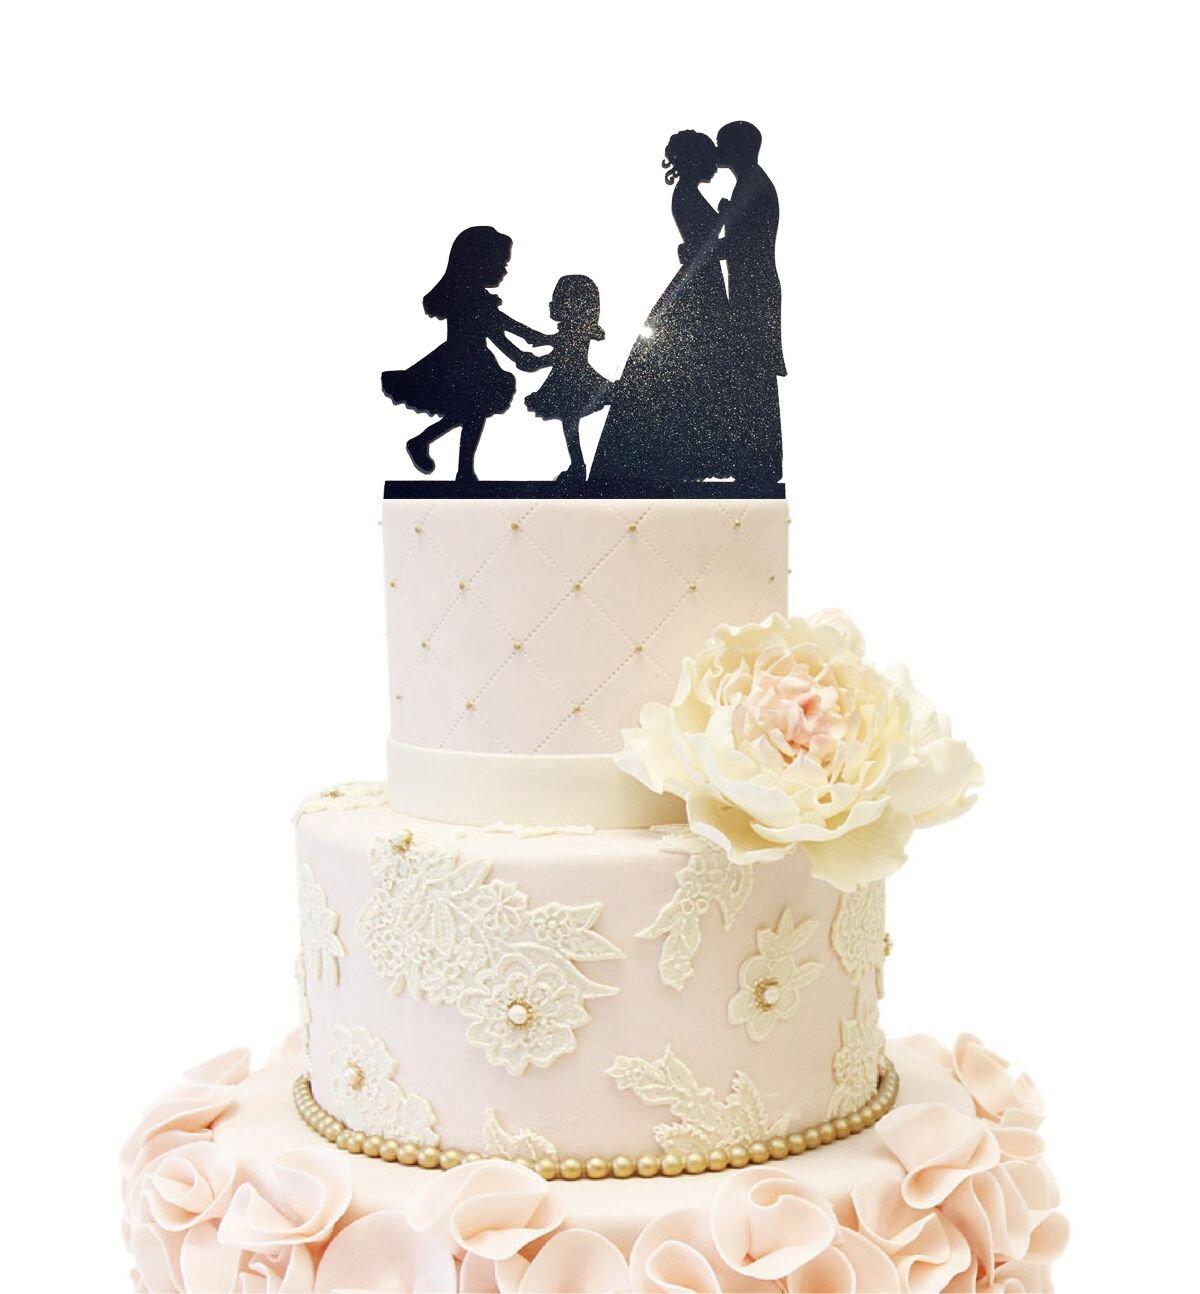 Wedding Anniverary Cake Topper couple Bride Groom with 2 Girls Dancing (2 Girls (Glitter Black))